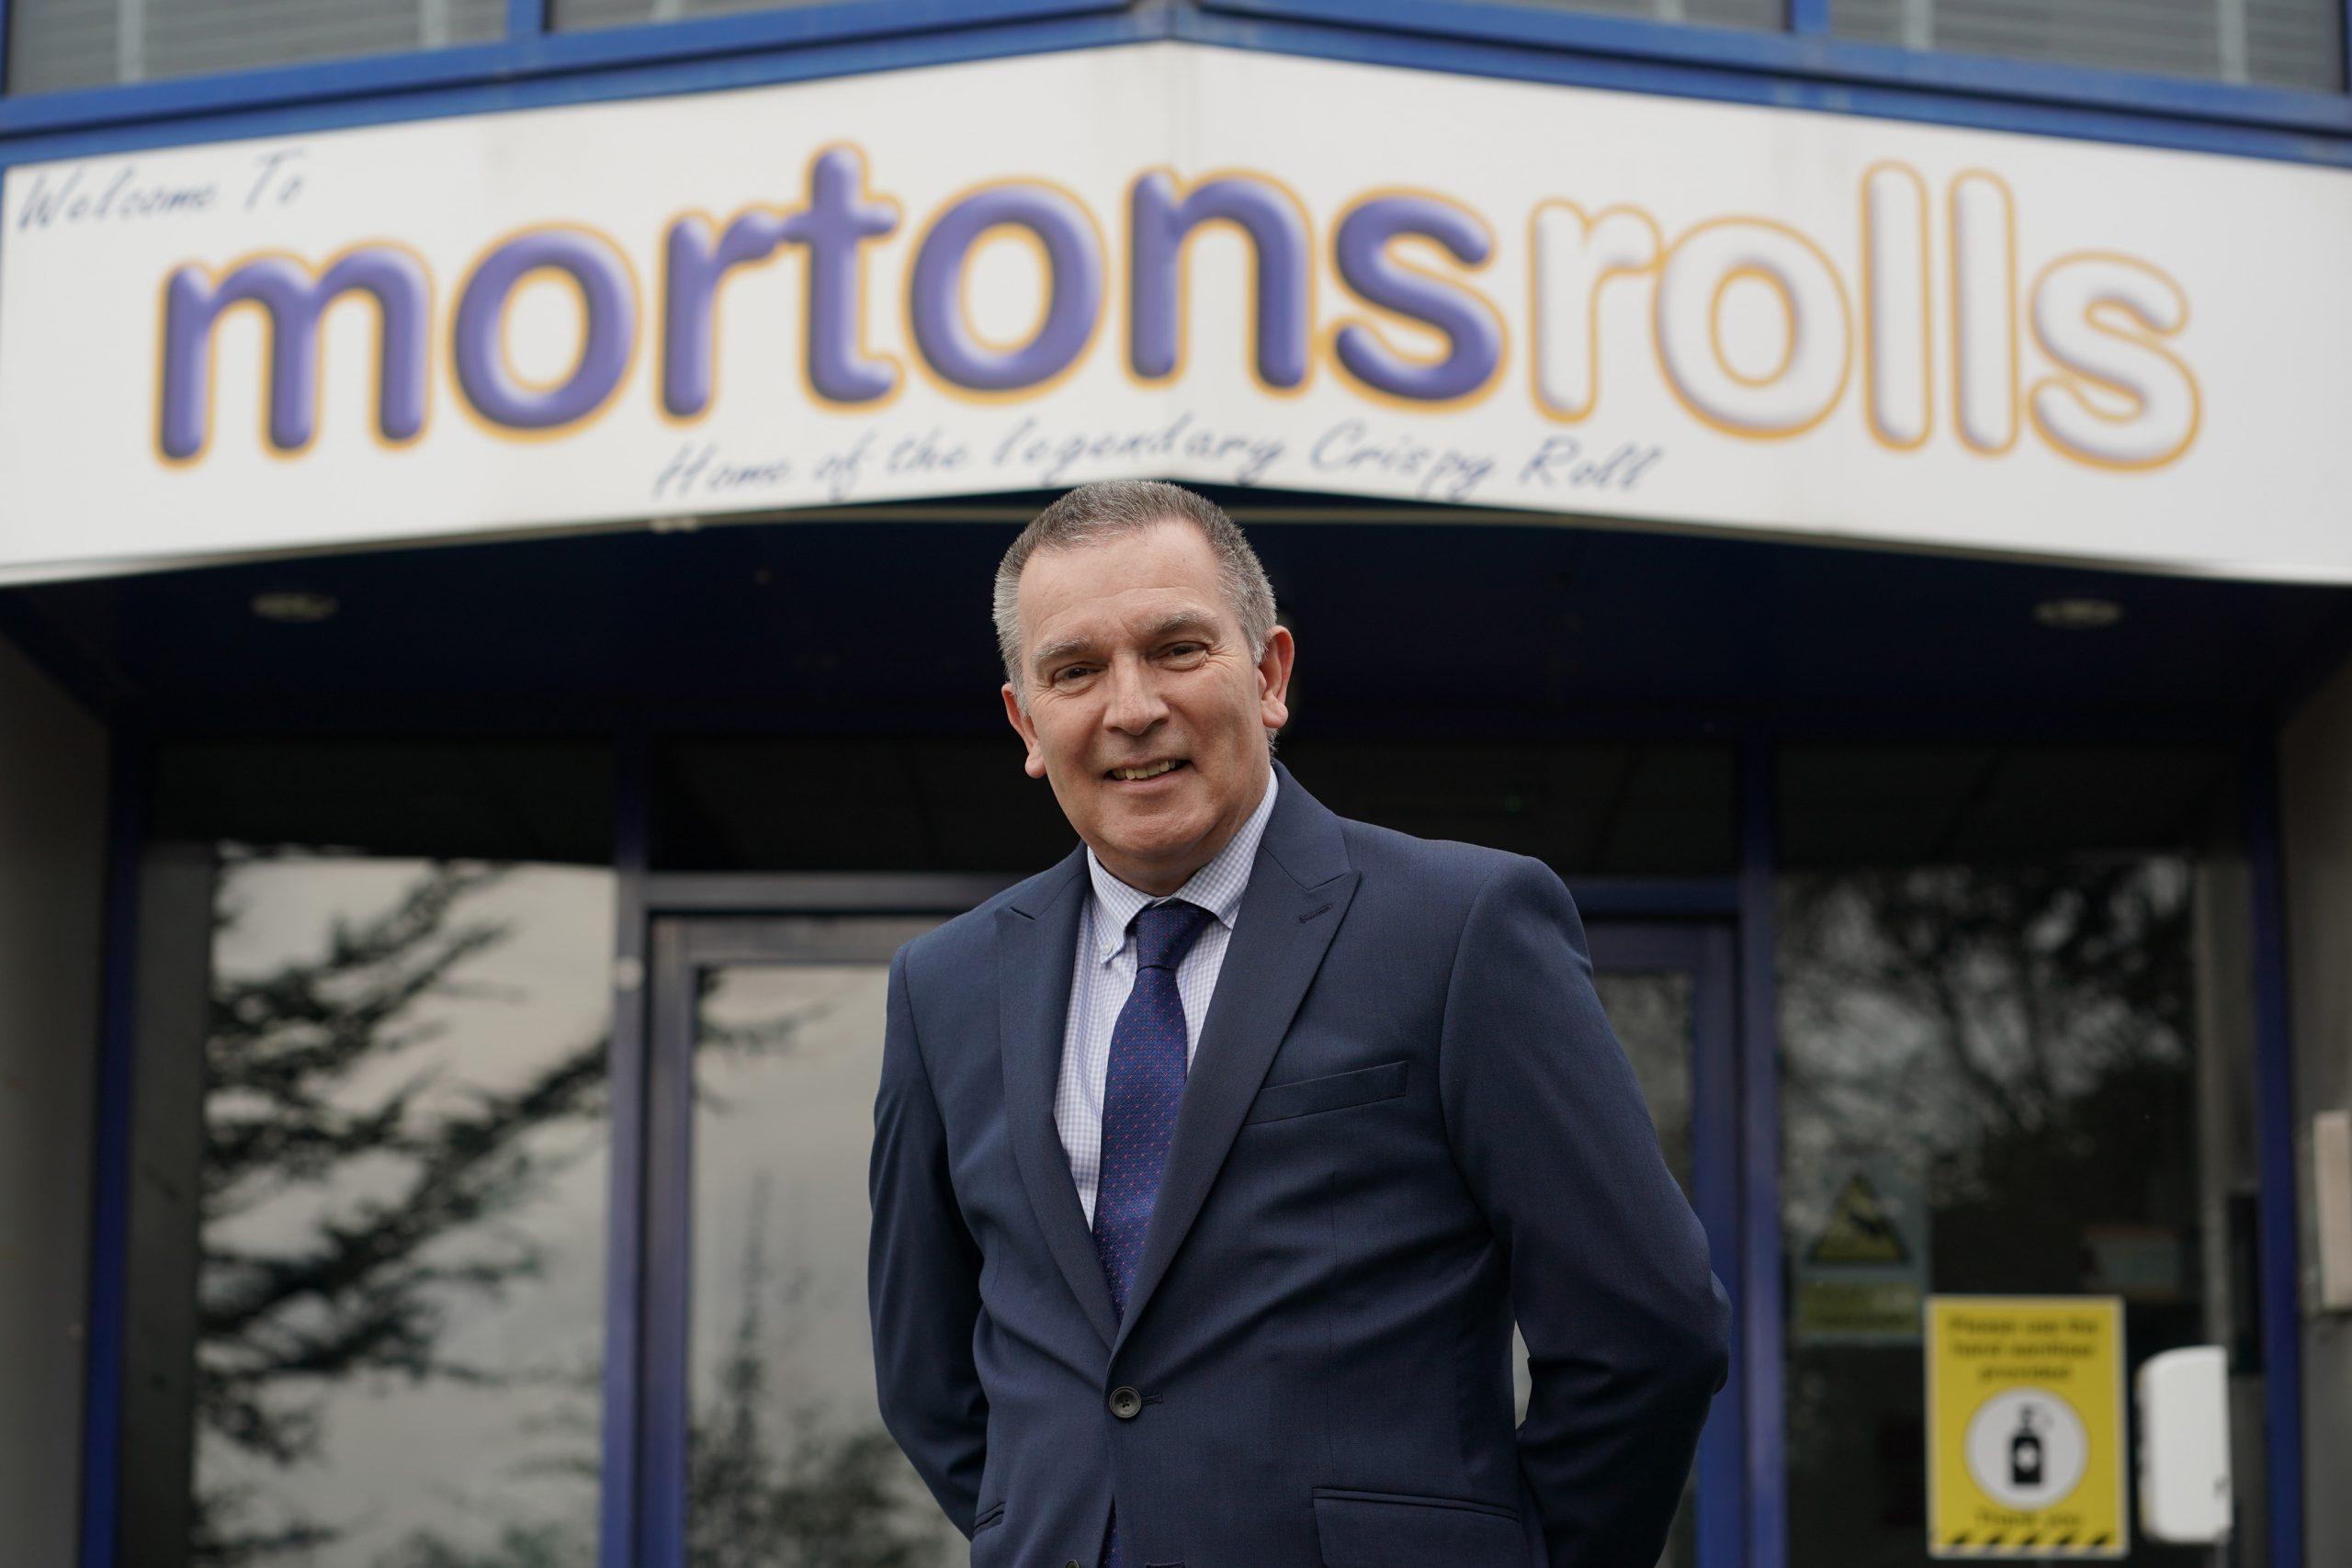 Mortons Rolls - Business News Scotland